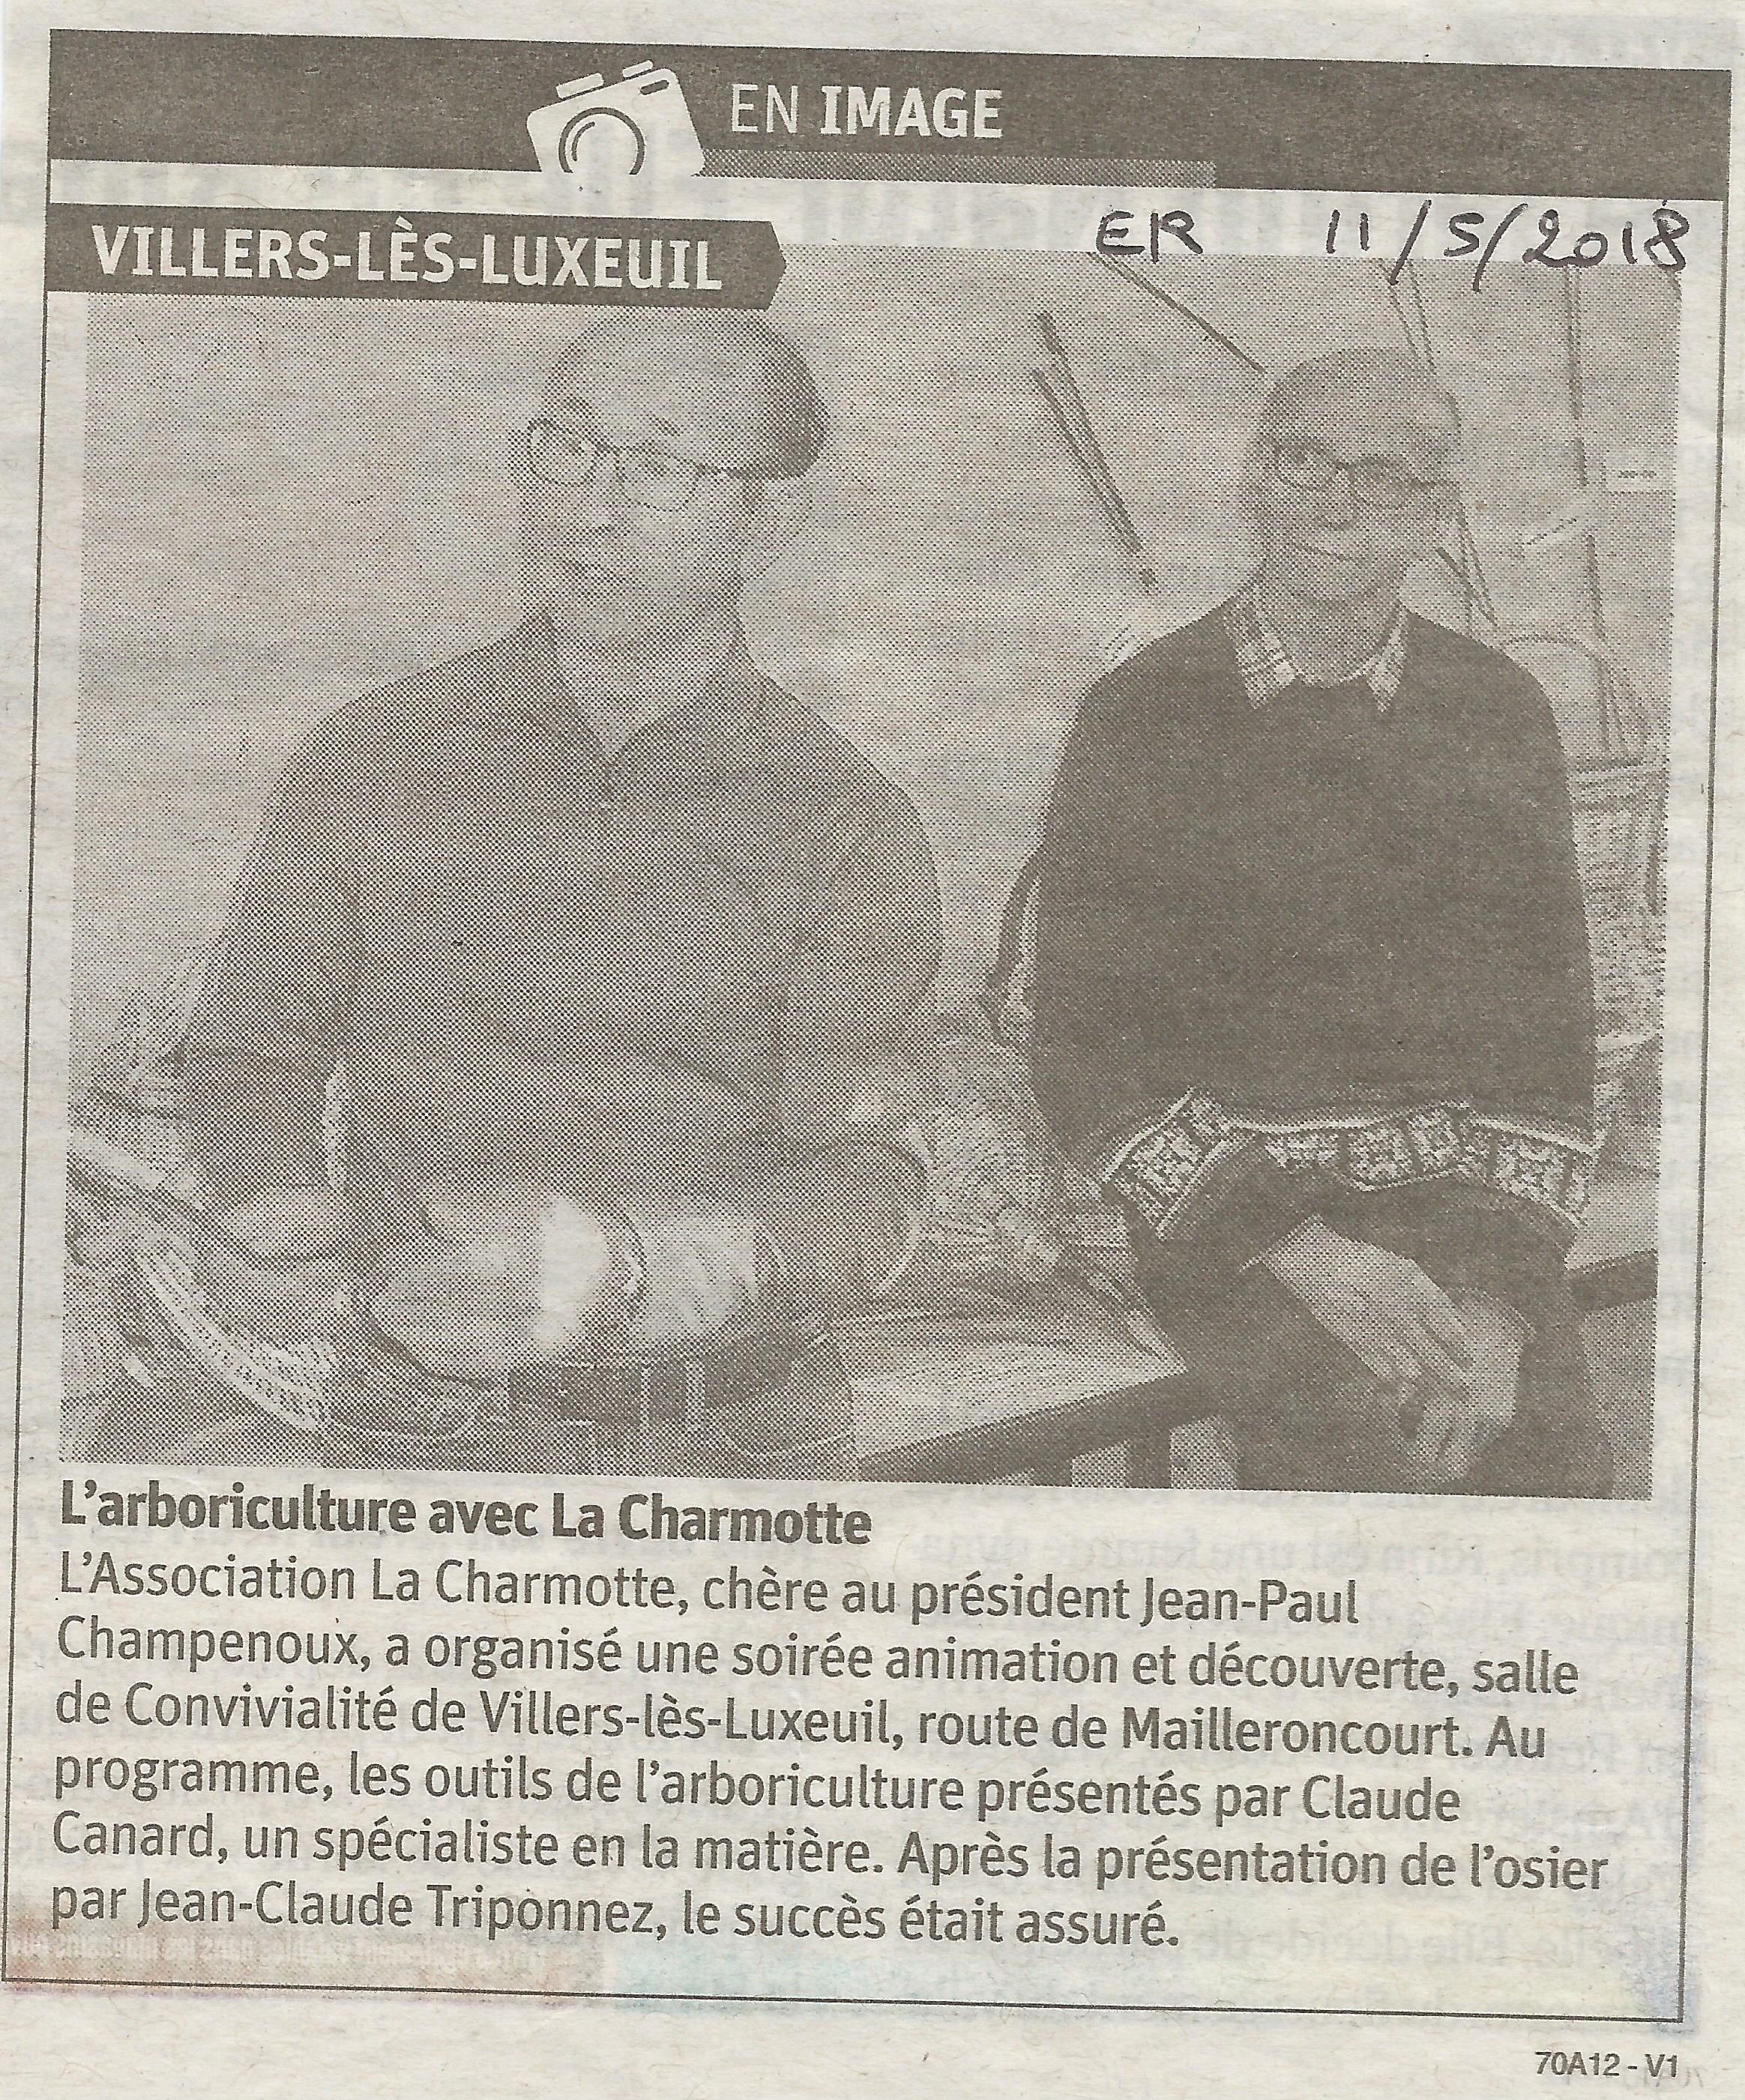 https://www.villers-les-luxeuil.com/projets/villers/files/images/2018_Mairie/Presse/2018_05_11.jpg